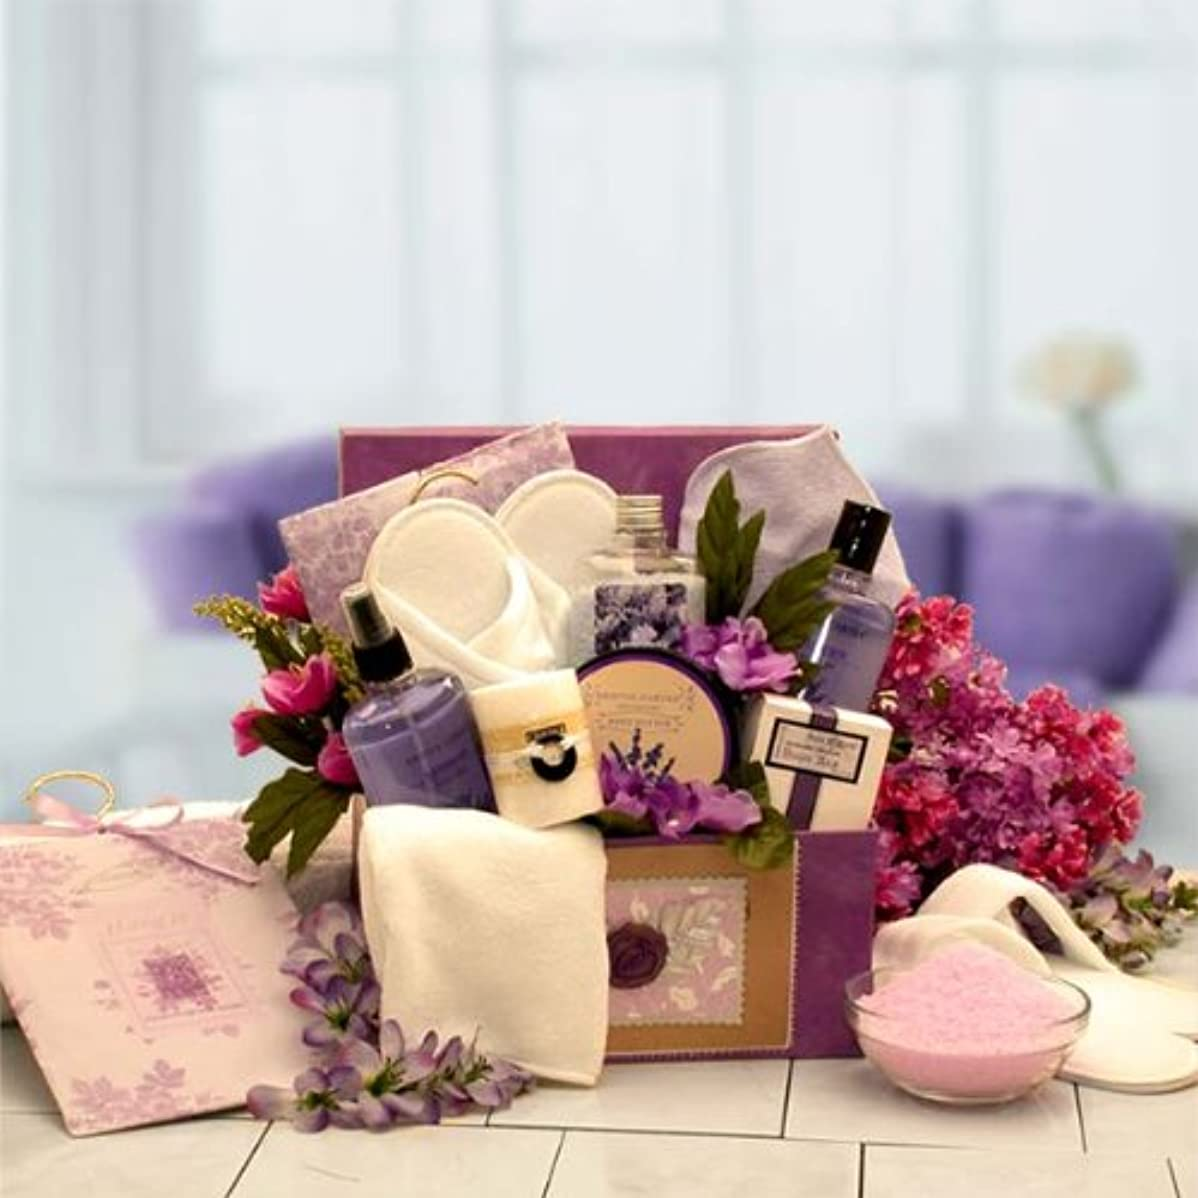 Spa Inspirations Bath and Body Gift Box- 8412952